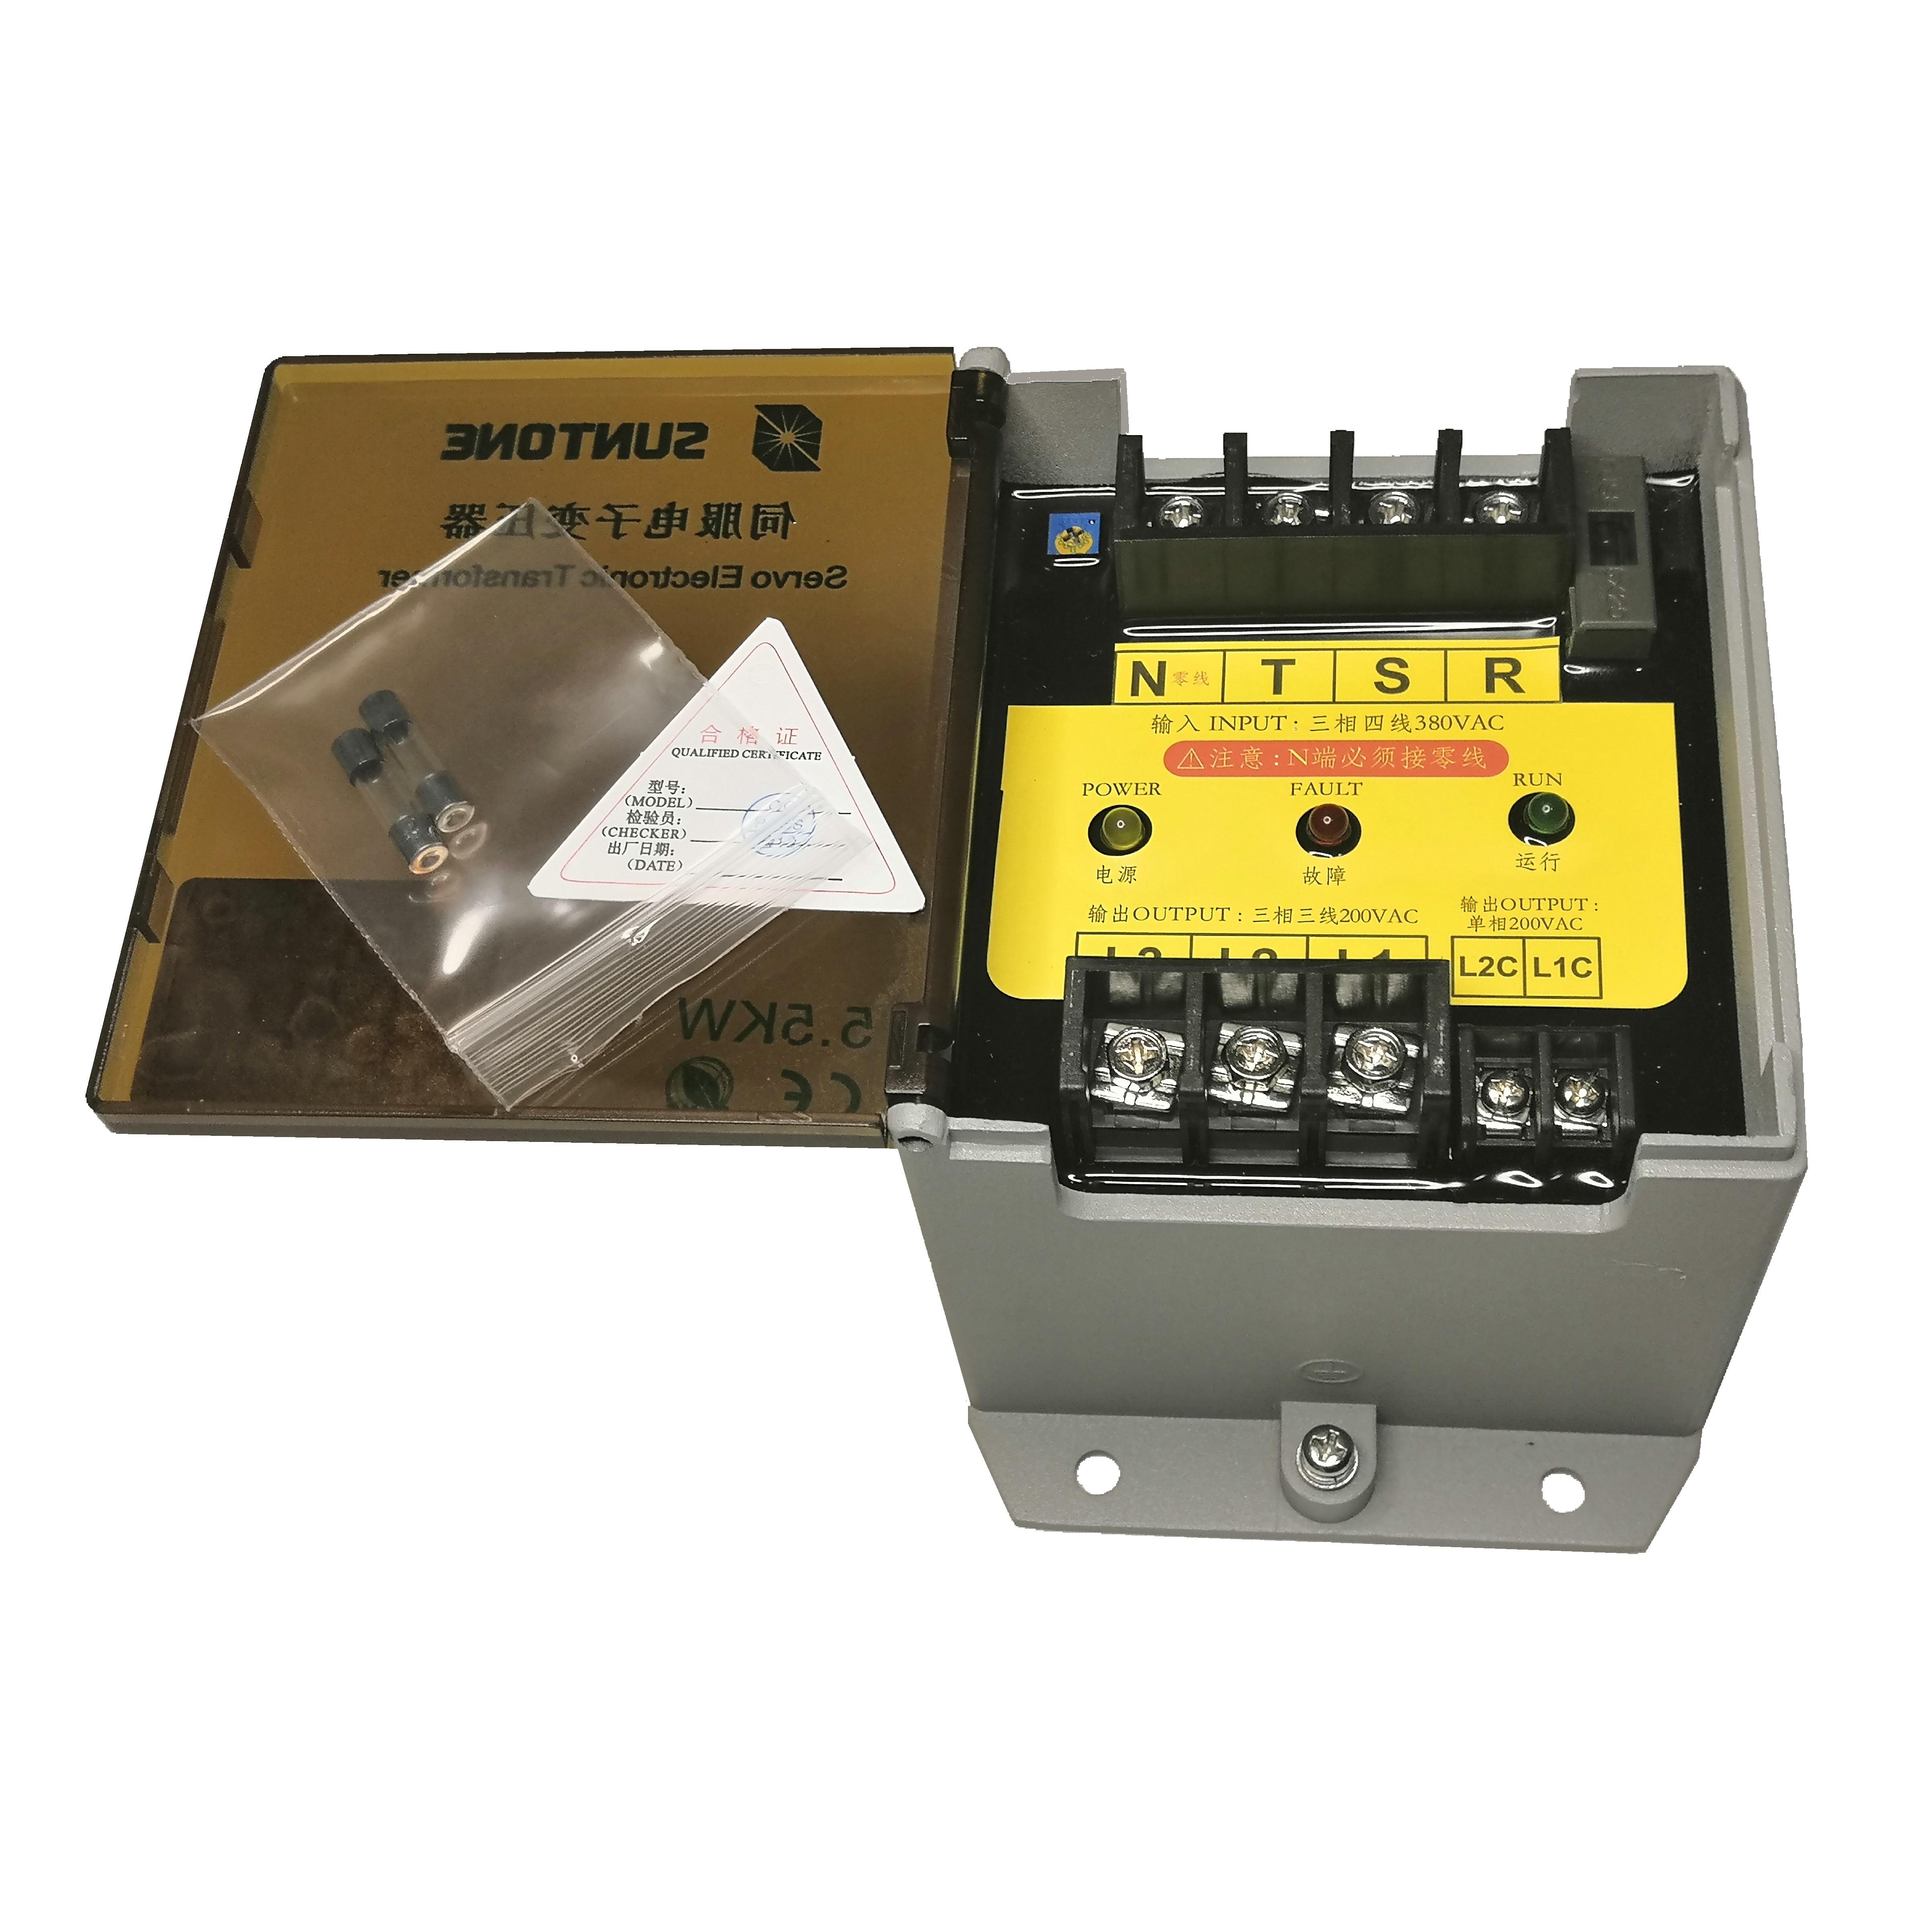 transformador eletronico servo de smp 55kw 1 b y suntone com servo de yaskawa abaixo de 55kw